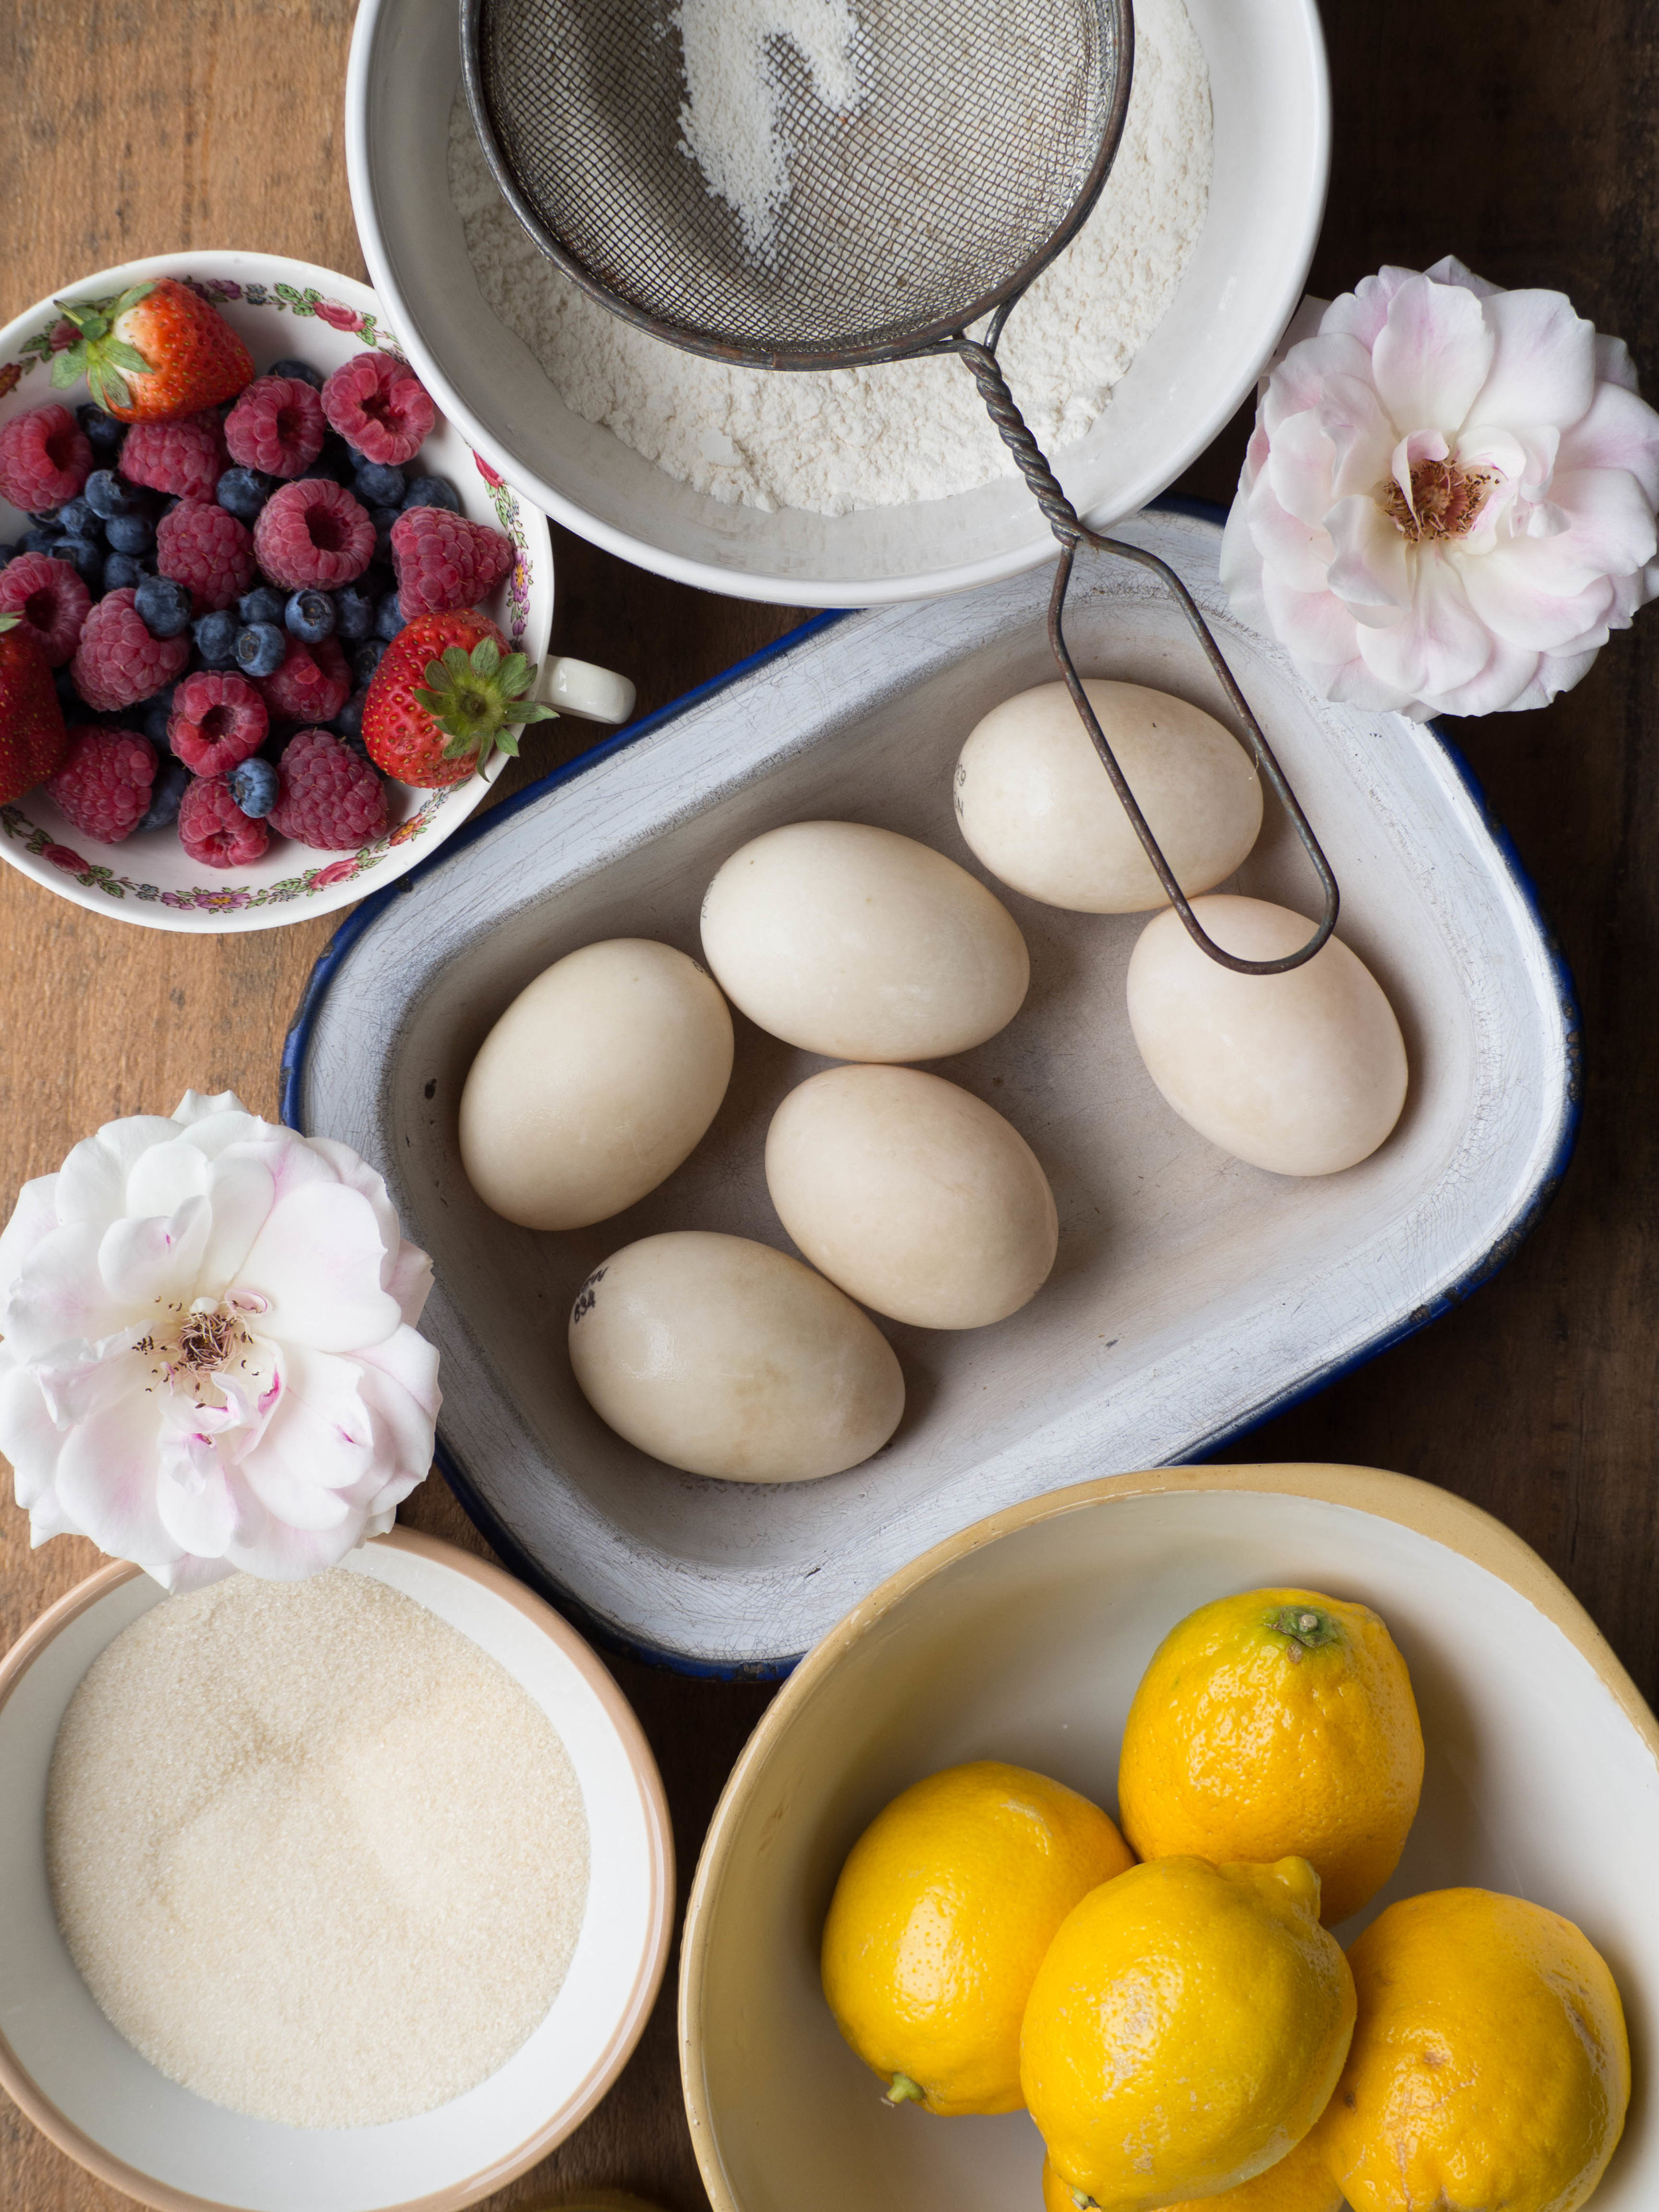 Using Duck Eggs to Make the Chiffon Cake